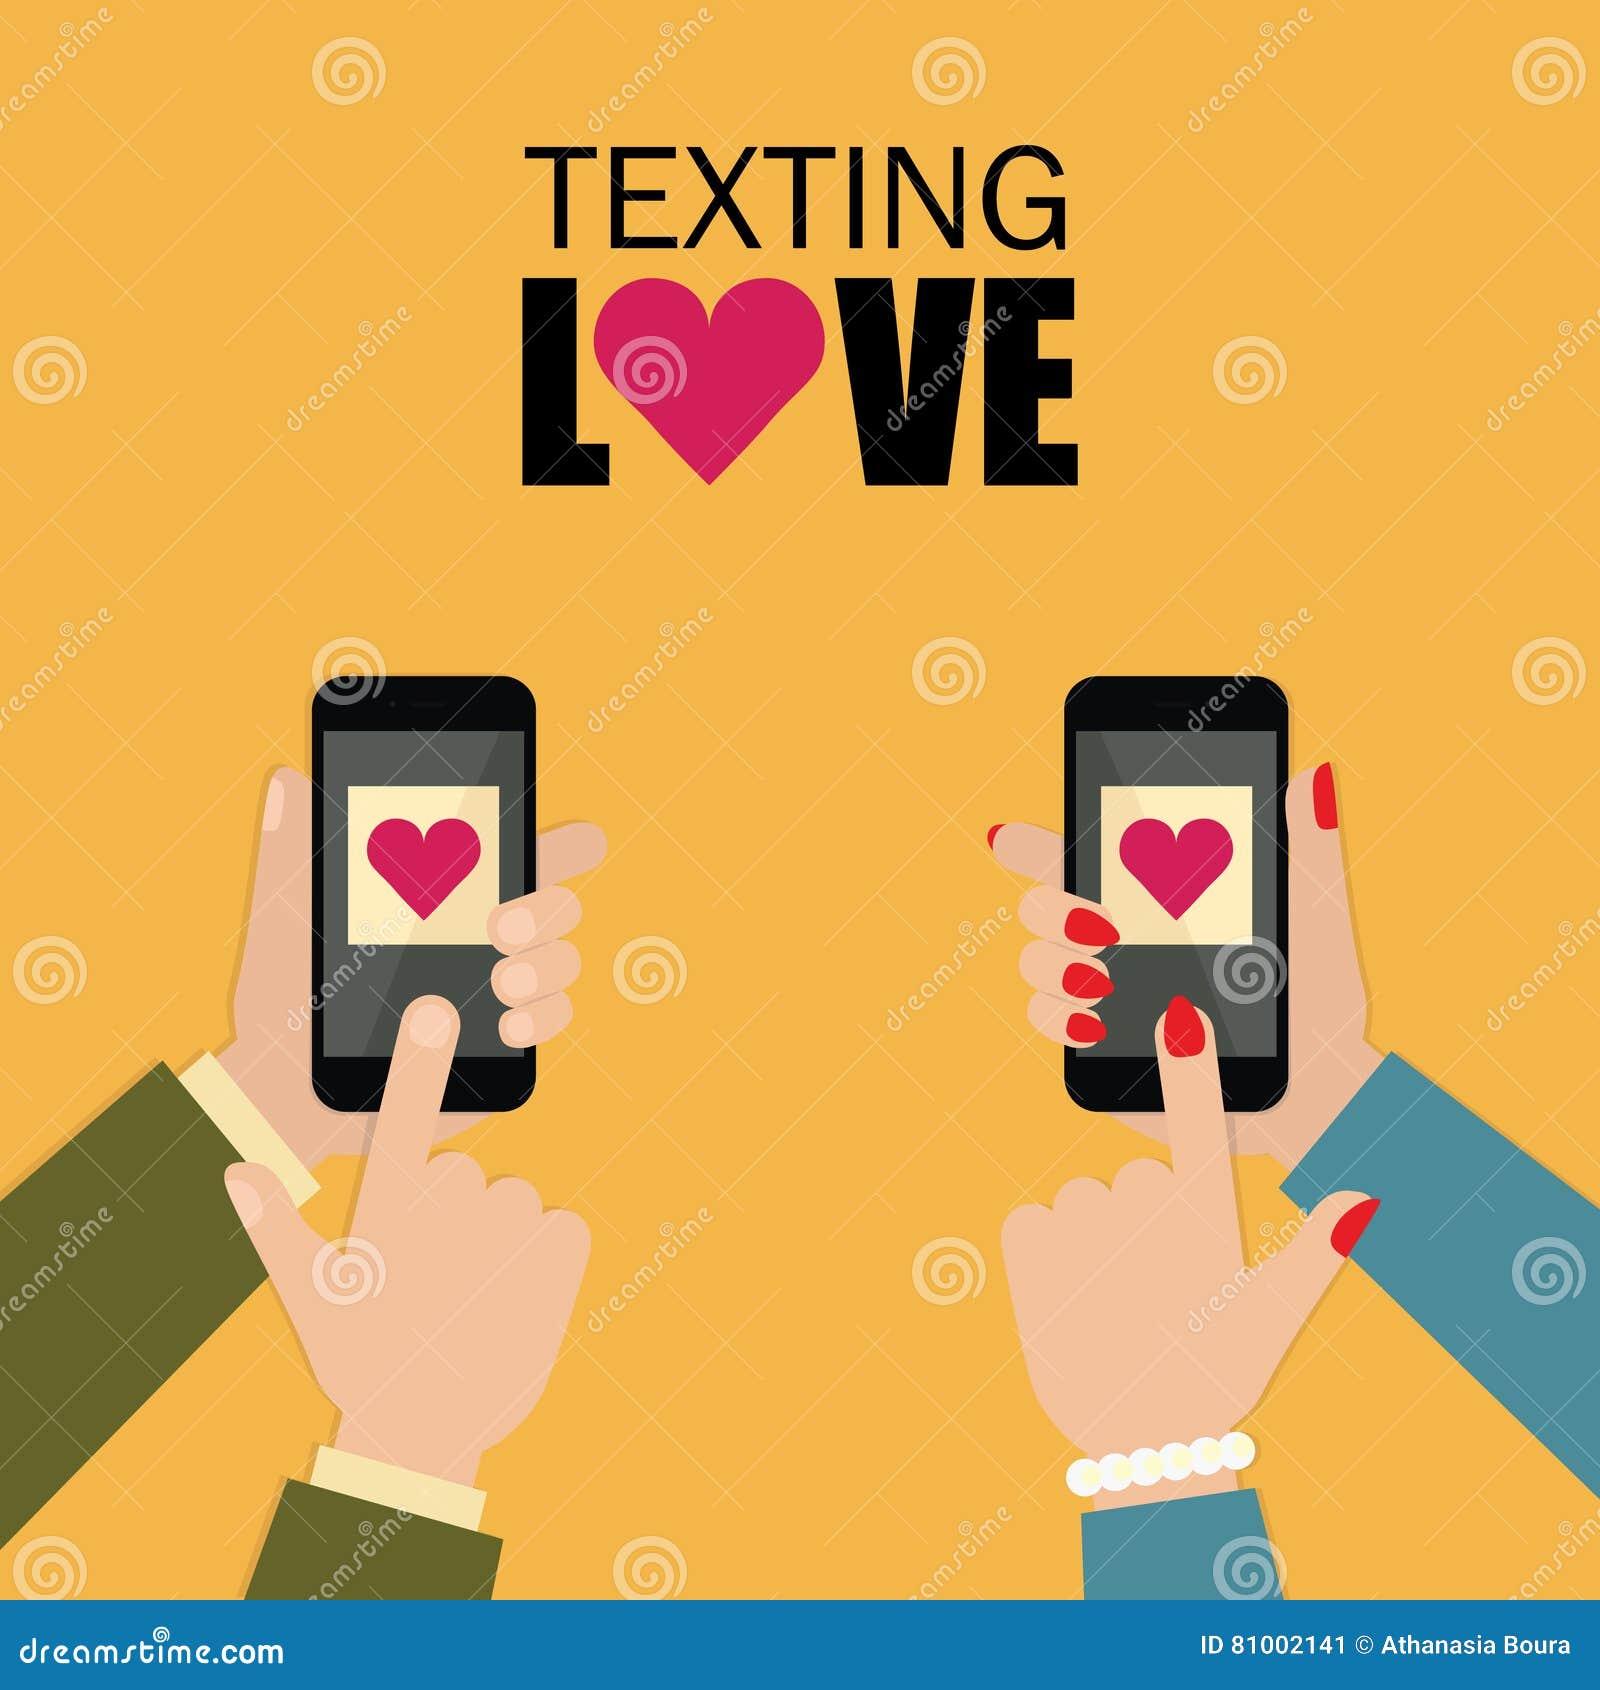 Sending messages online dating